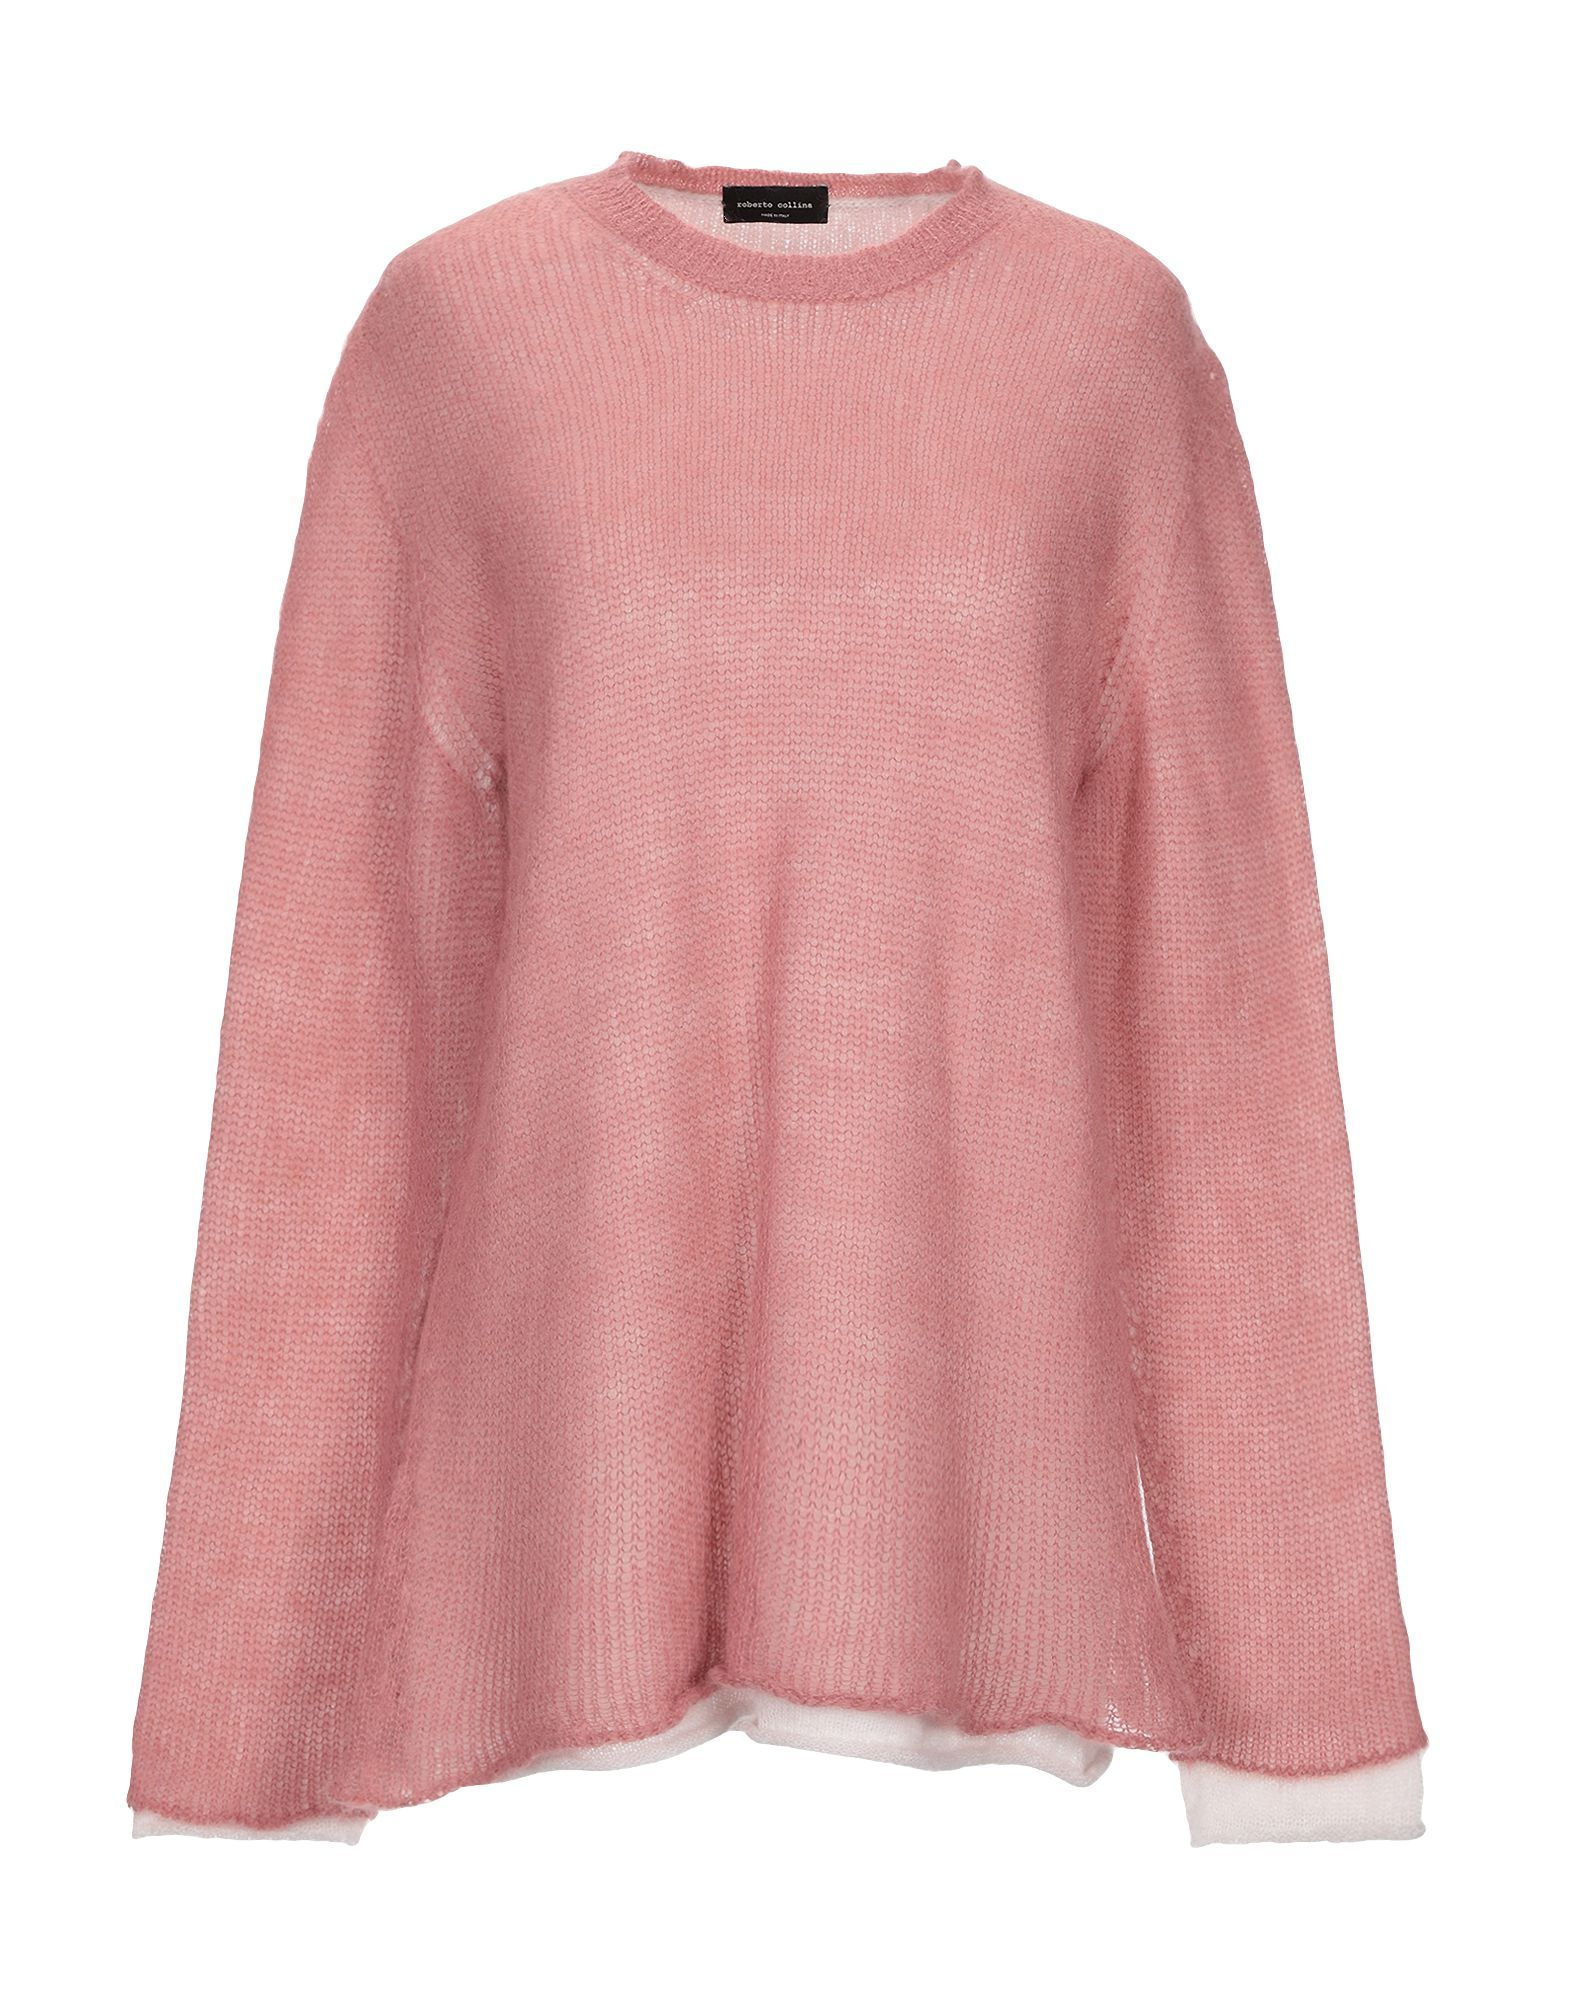 Knitwear Roberto Collina Pastel Pink Women's Mohair Wool